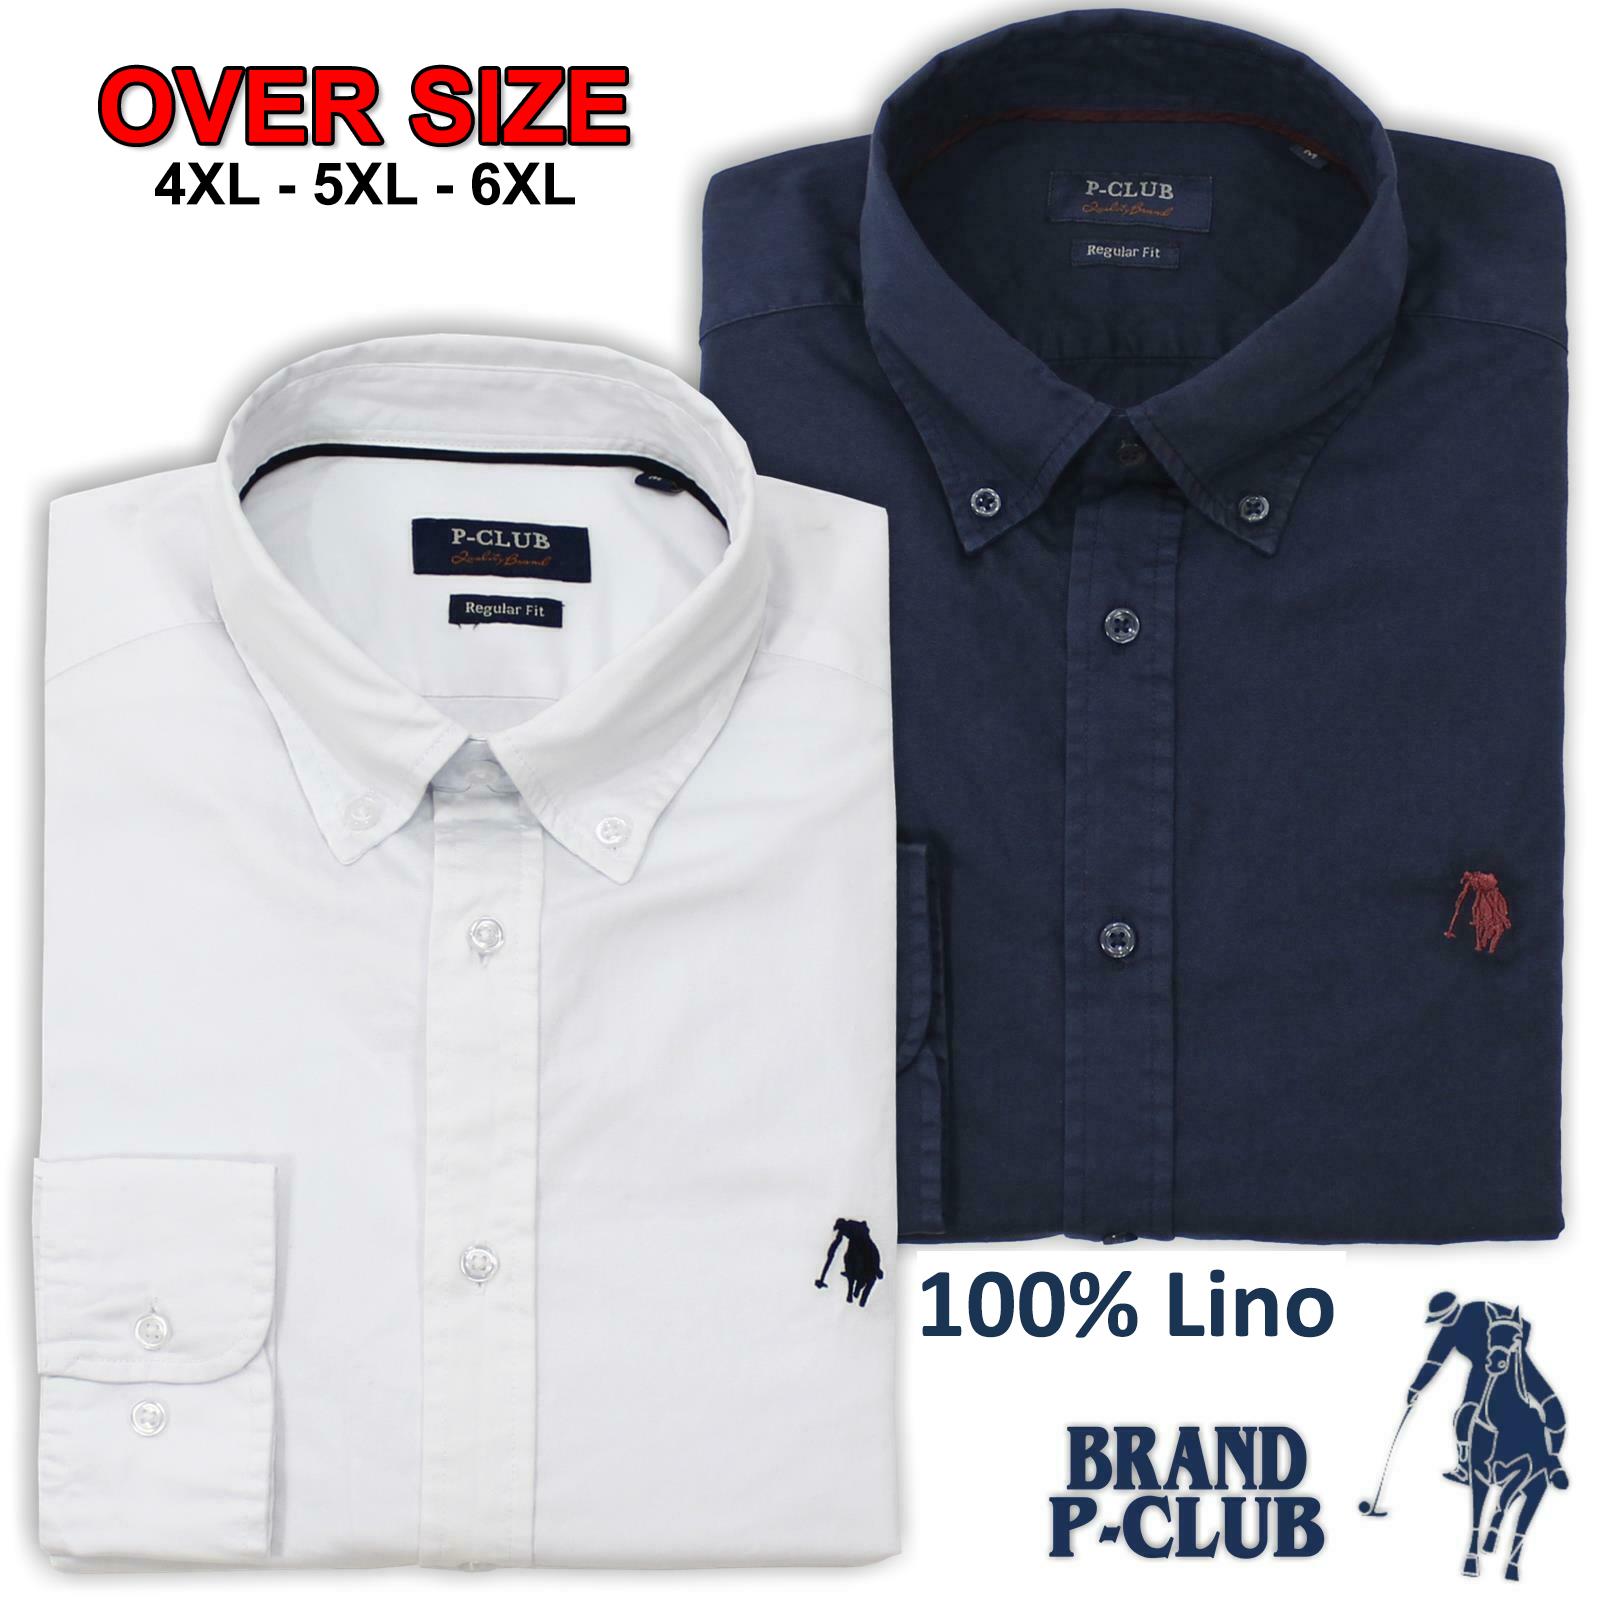 69813d355a Camicia Uomo 100% Lino Polo Club Manica Lunga Taglie Forti 3XL 4XL 5XL 6XL  Over Size